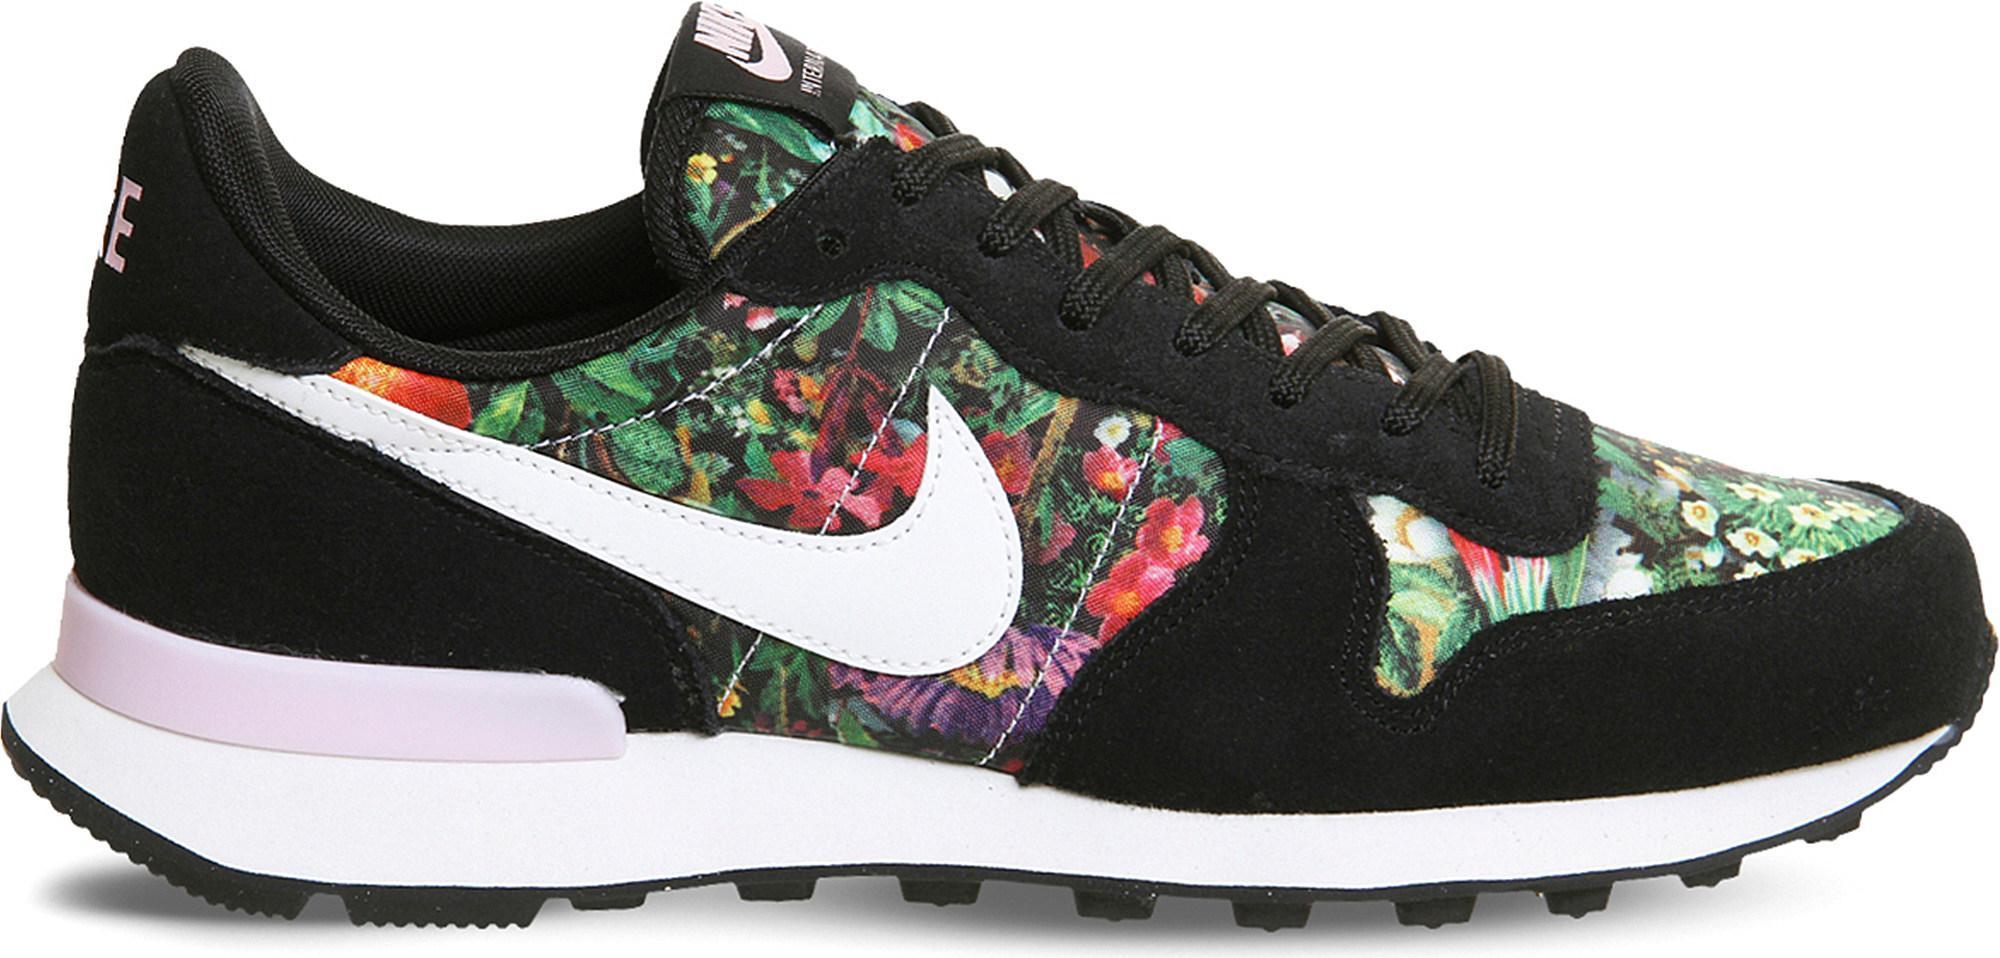 Men Nike Internationalist Floral Trainers Black White Pink 519807